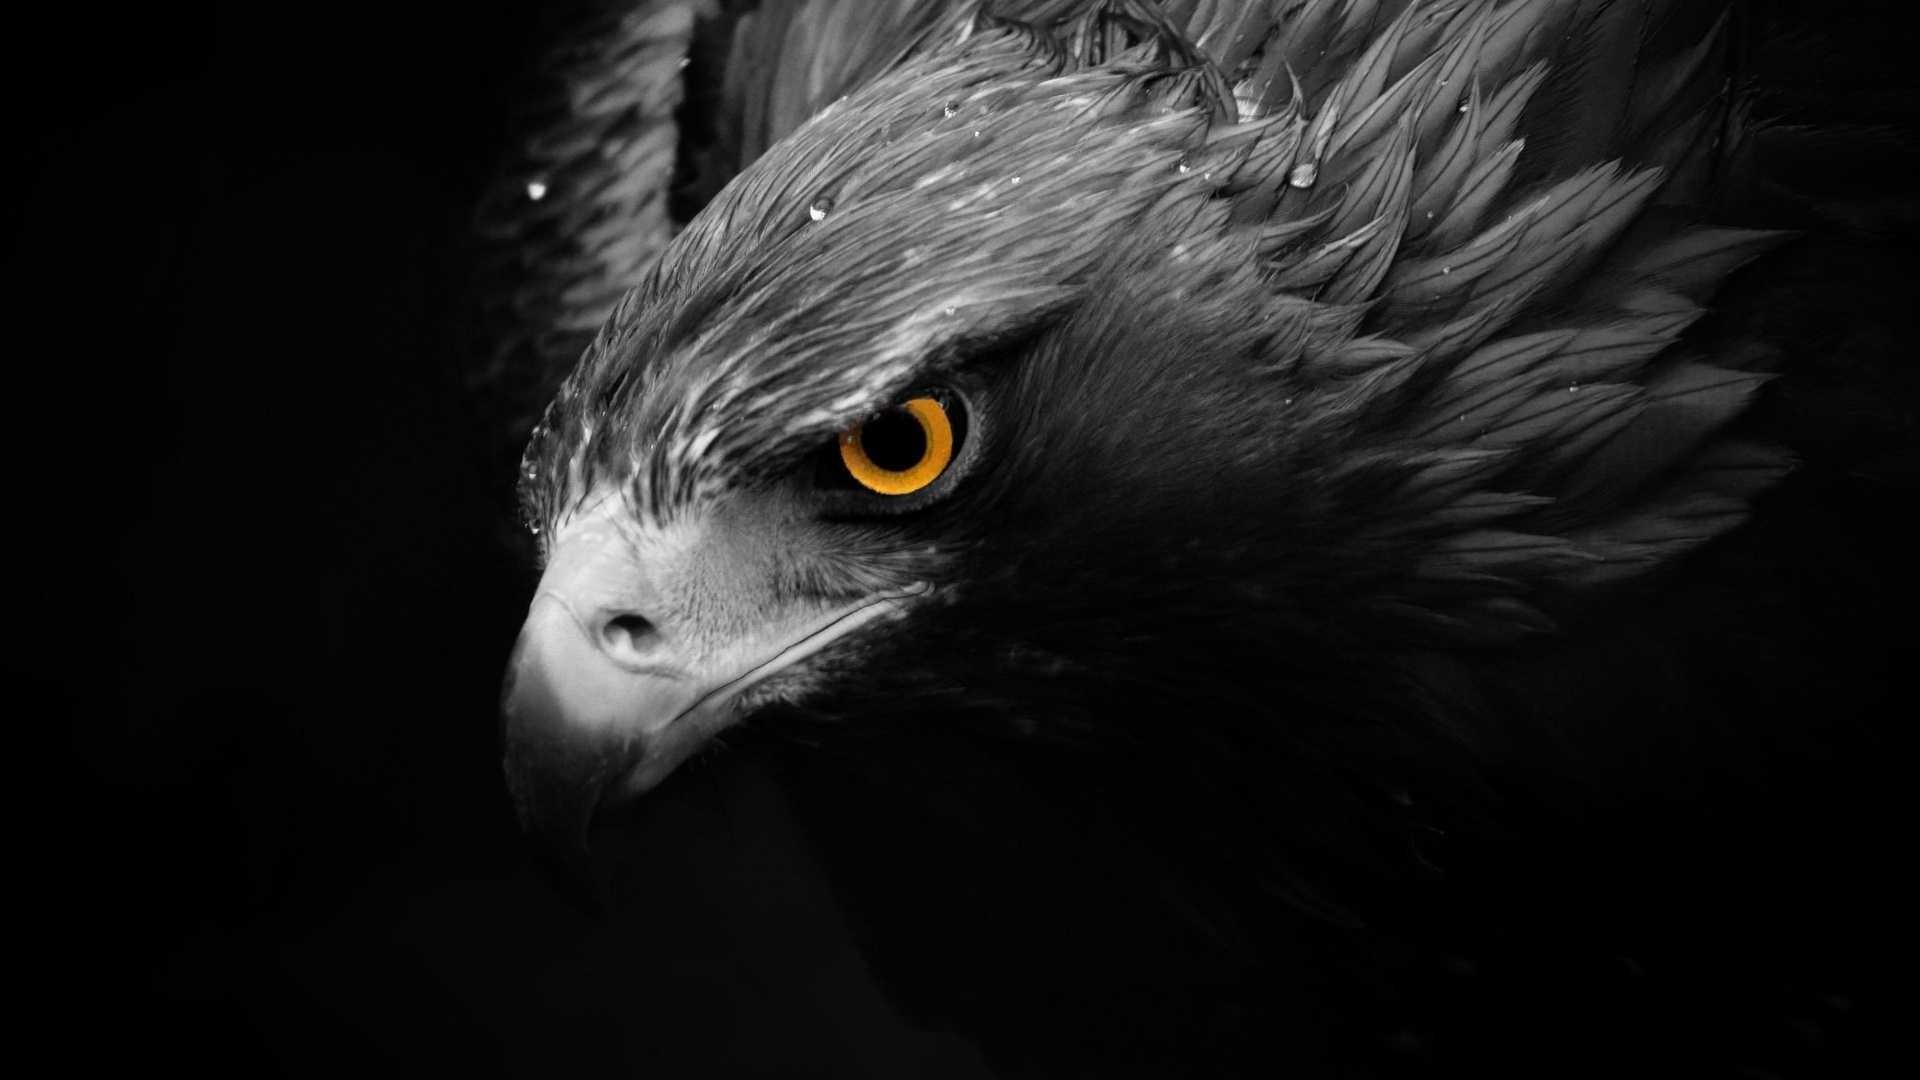 Eagle Wallpaper HD – Eagle Images & Eagles HD Wallpapers